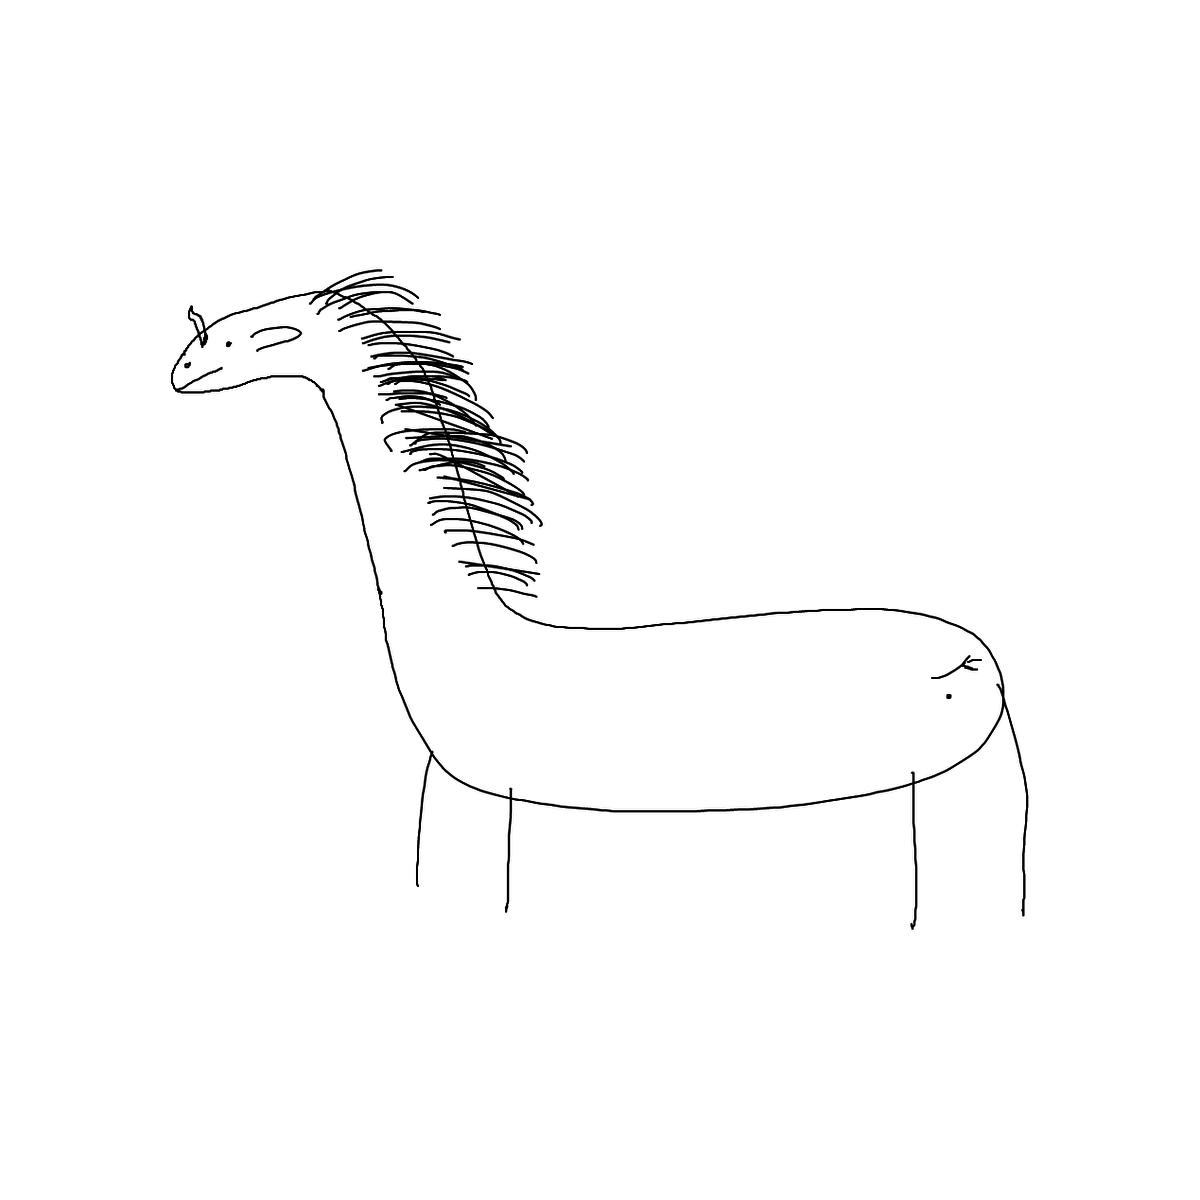 BAAAM drawing#9386 lat:52.4748725891113300lng: 13.4073524475097660